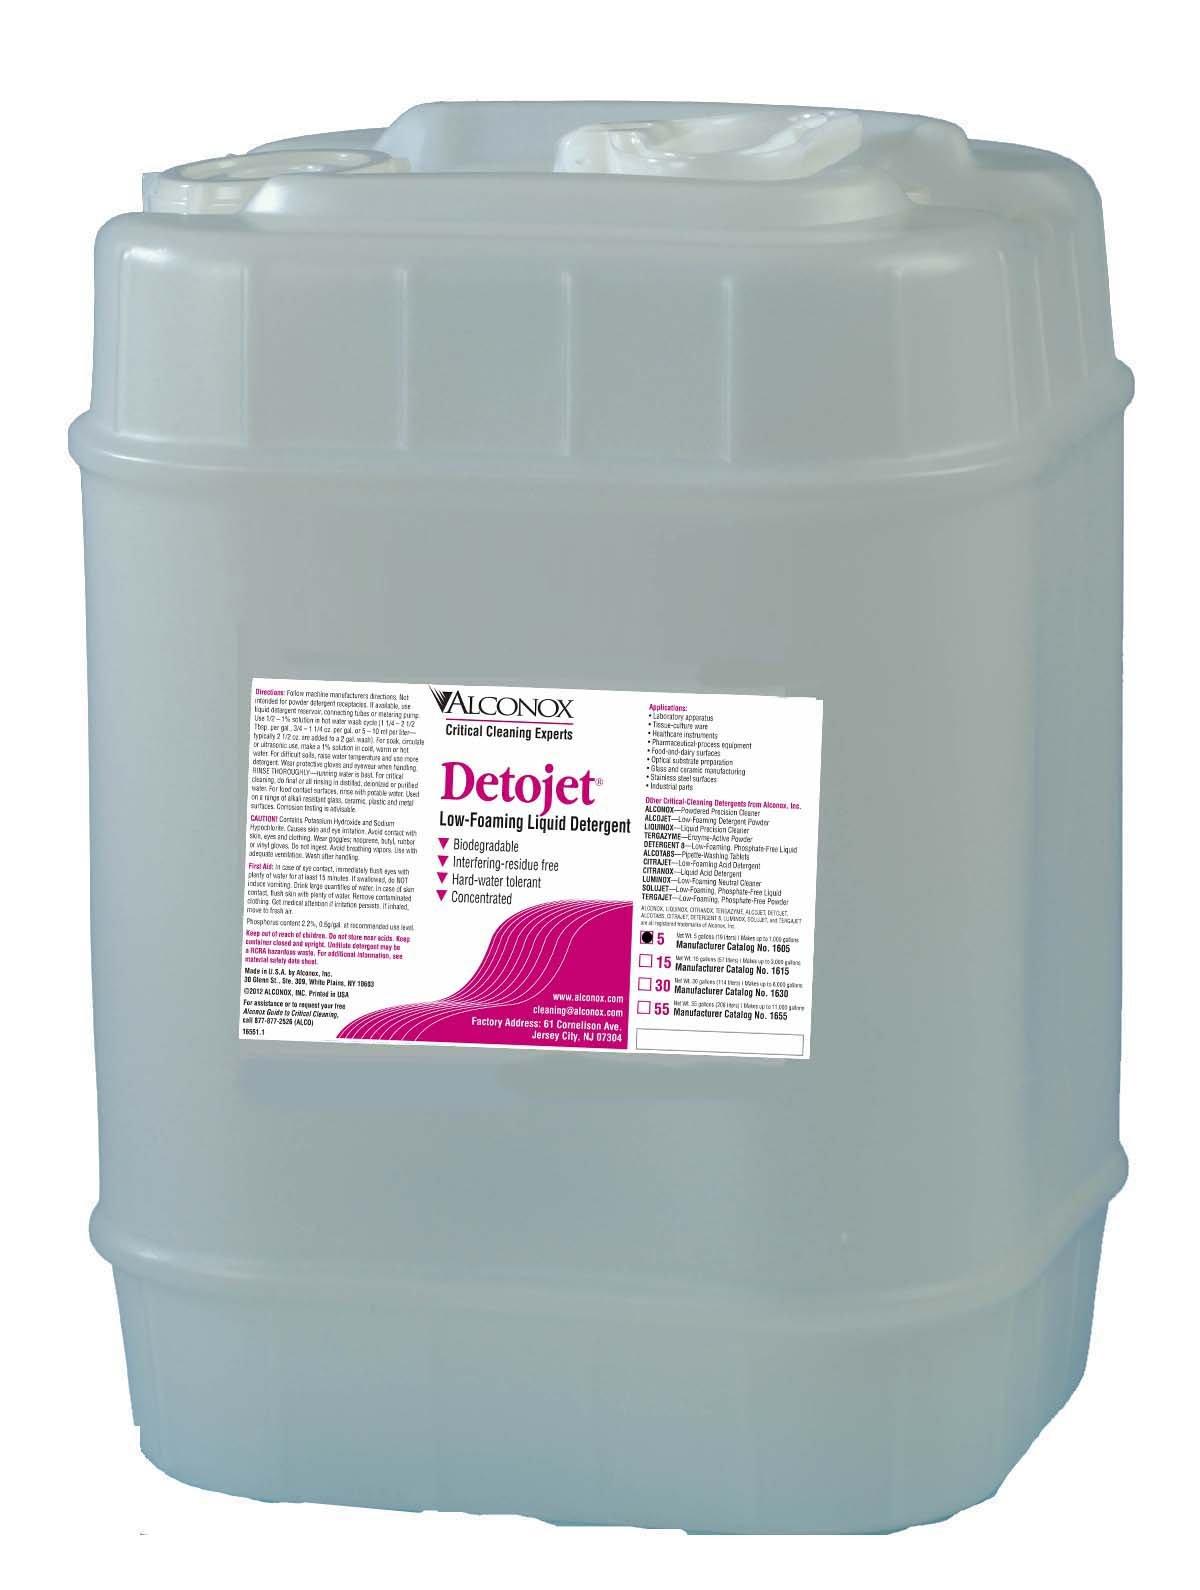 Alconox 1605 Detojet Low Foaming Liquid Detergent, 5 Gallon Jerrycan